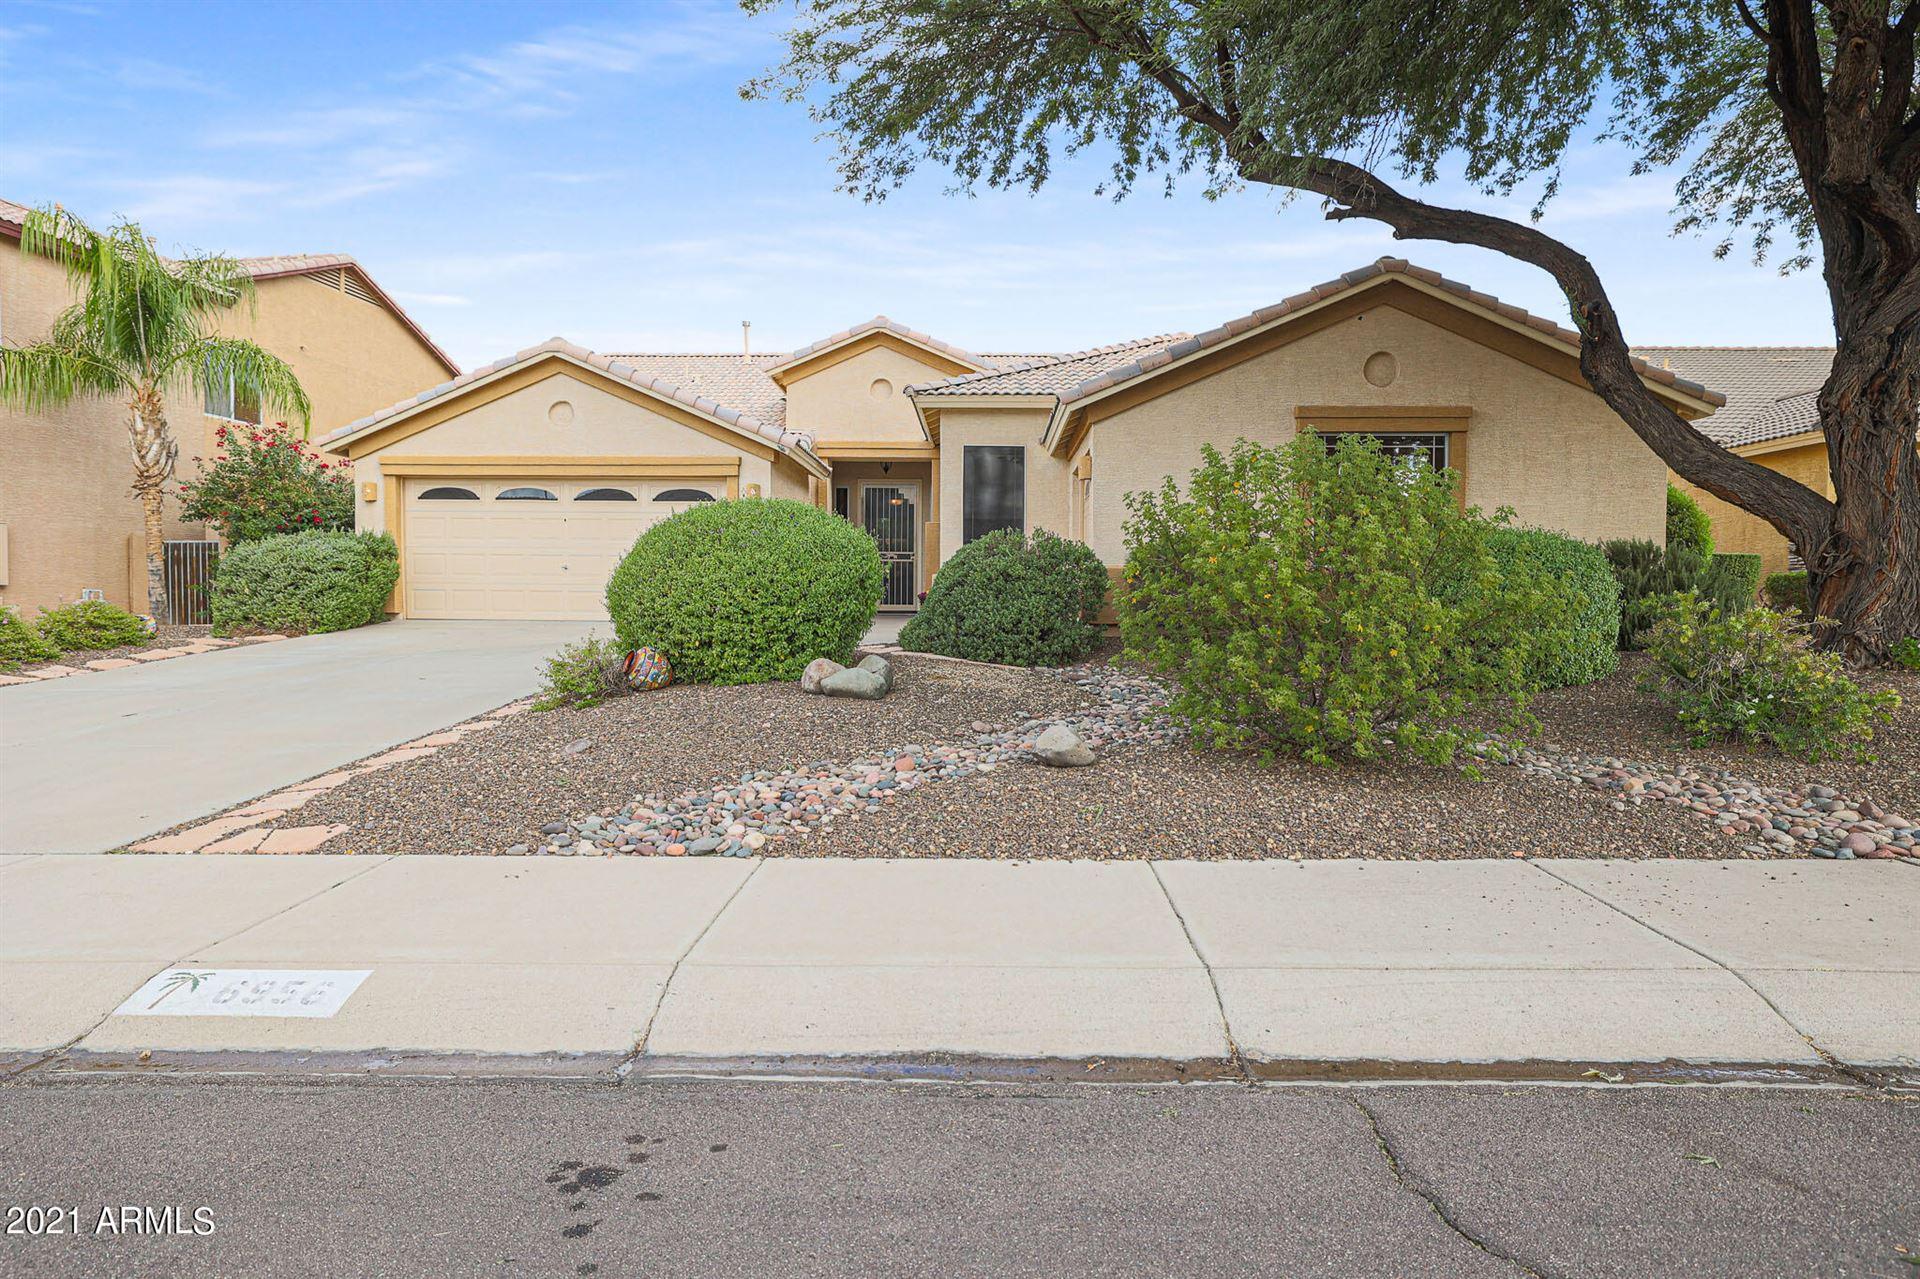 6956 W HONEYSUCKLE Drive, Peoria, AZ 85383 - MLS#: 6309289